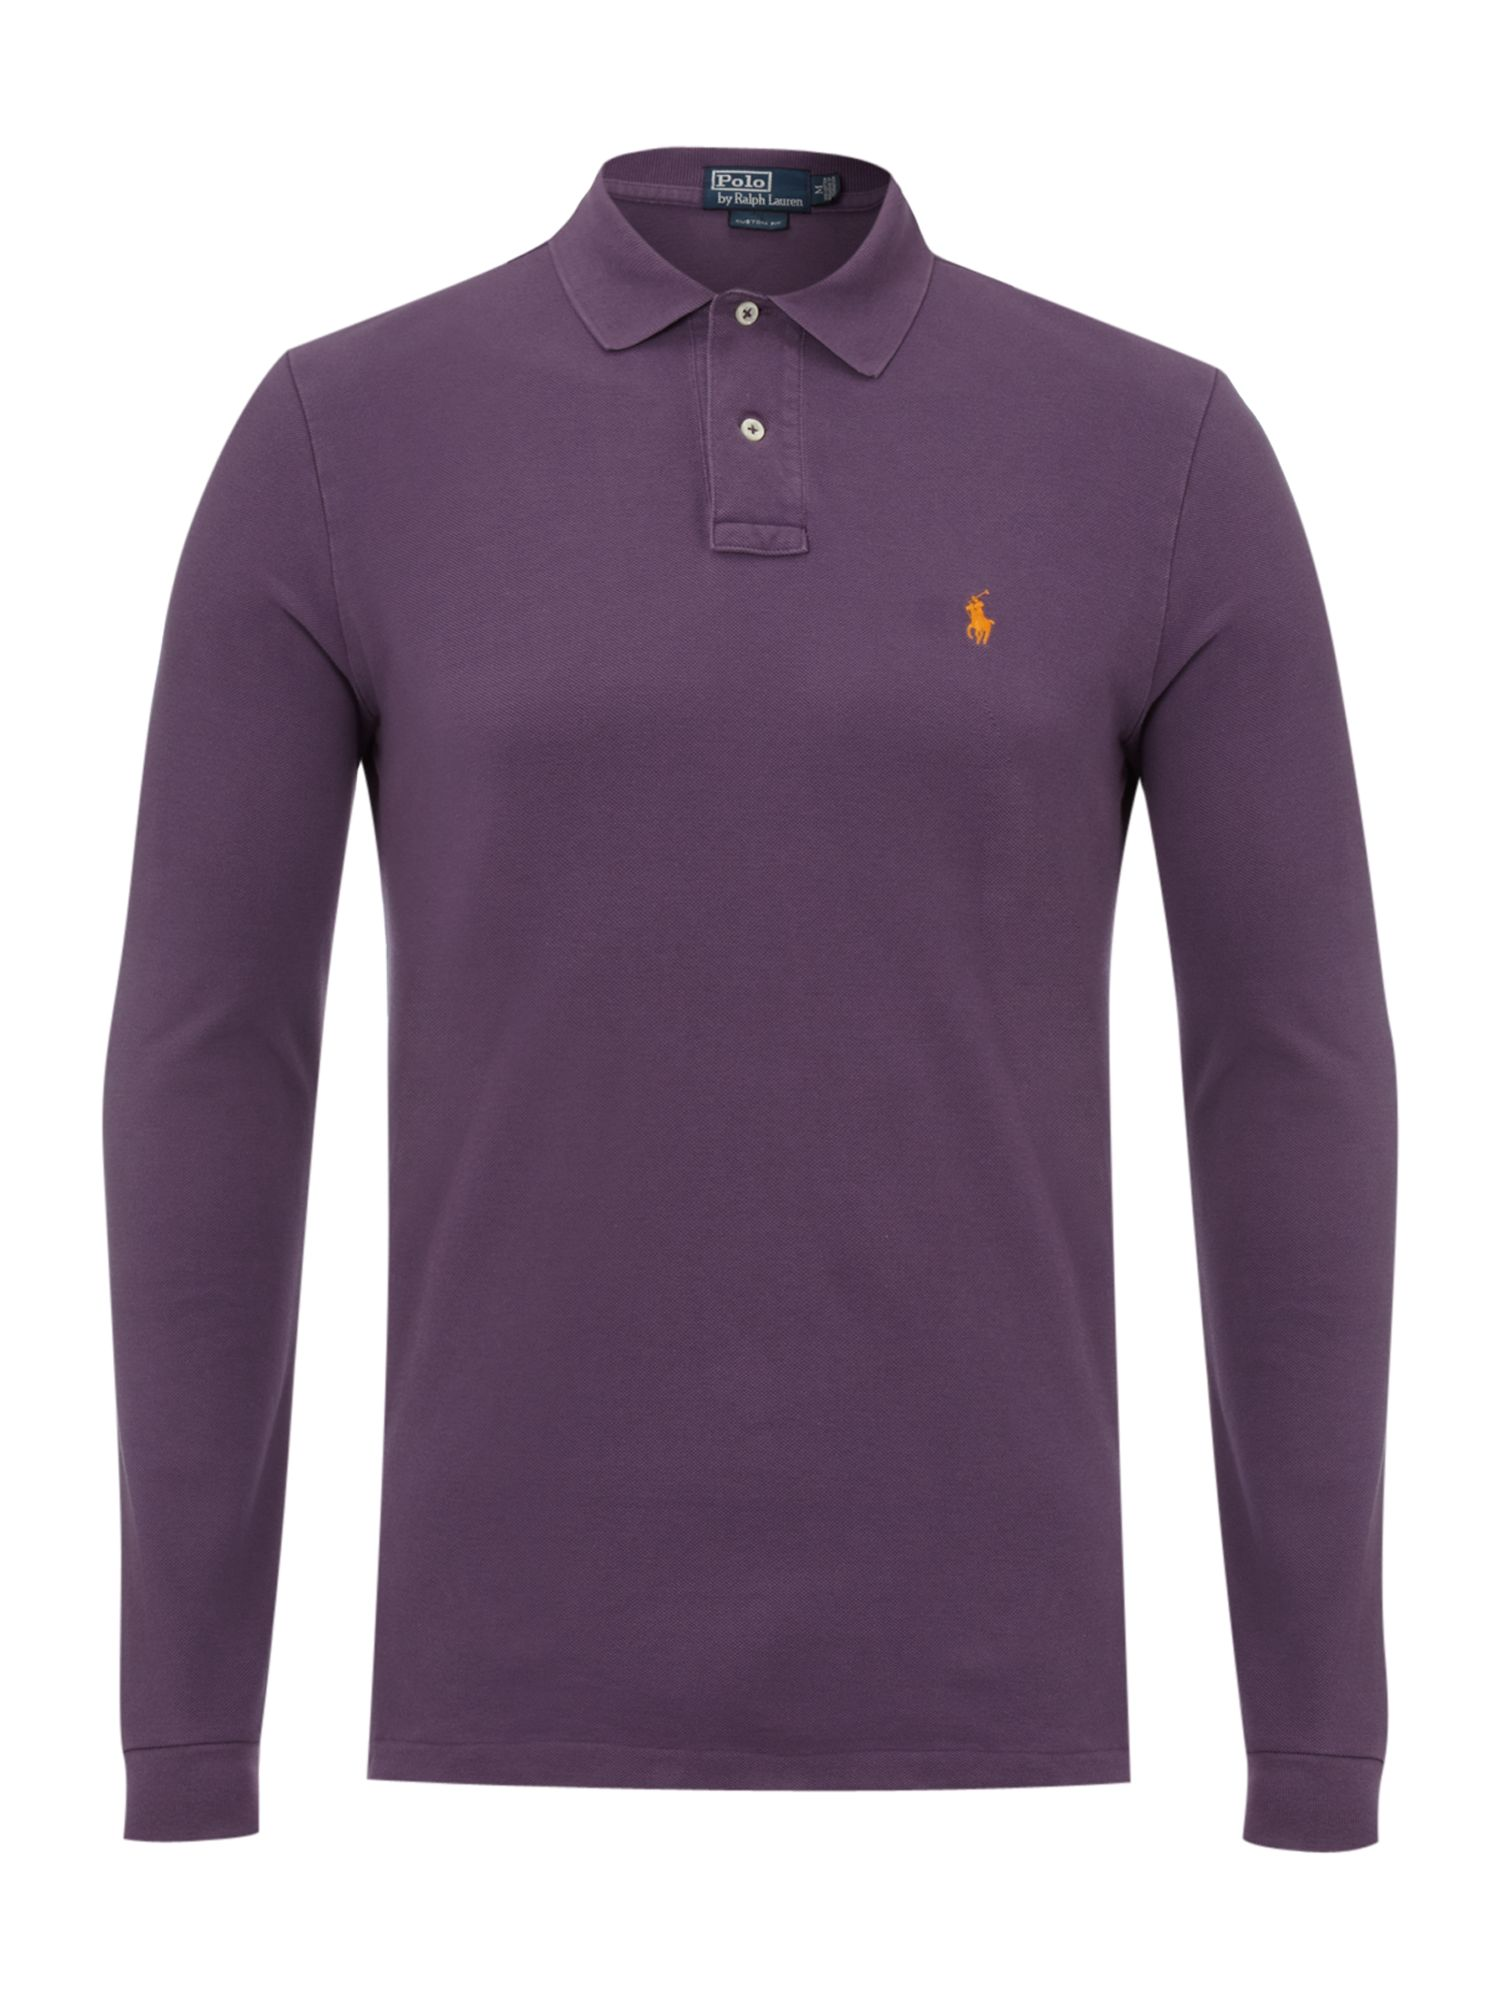 Polo ralph lauren weathered mesh long sleeve custom fit for Long sleeve purple polo shirt